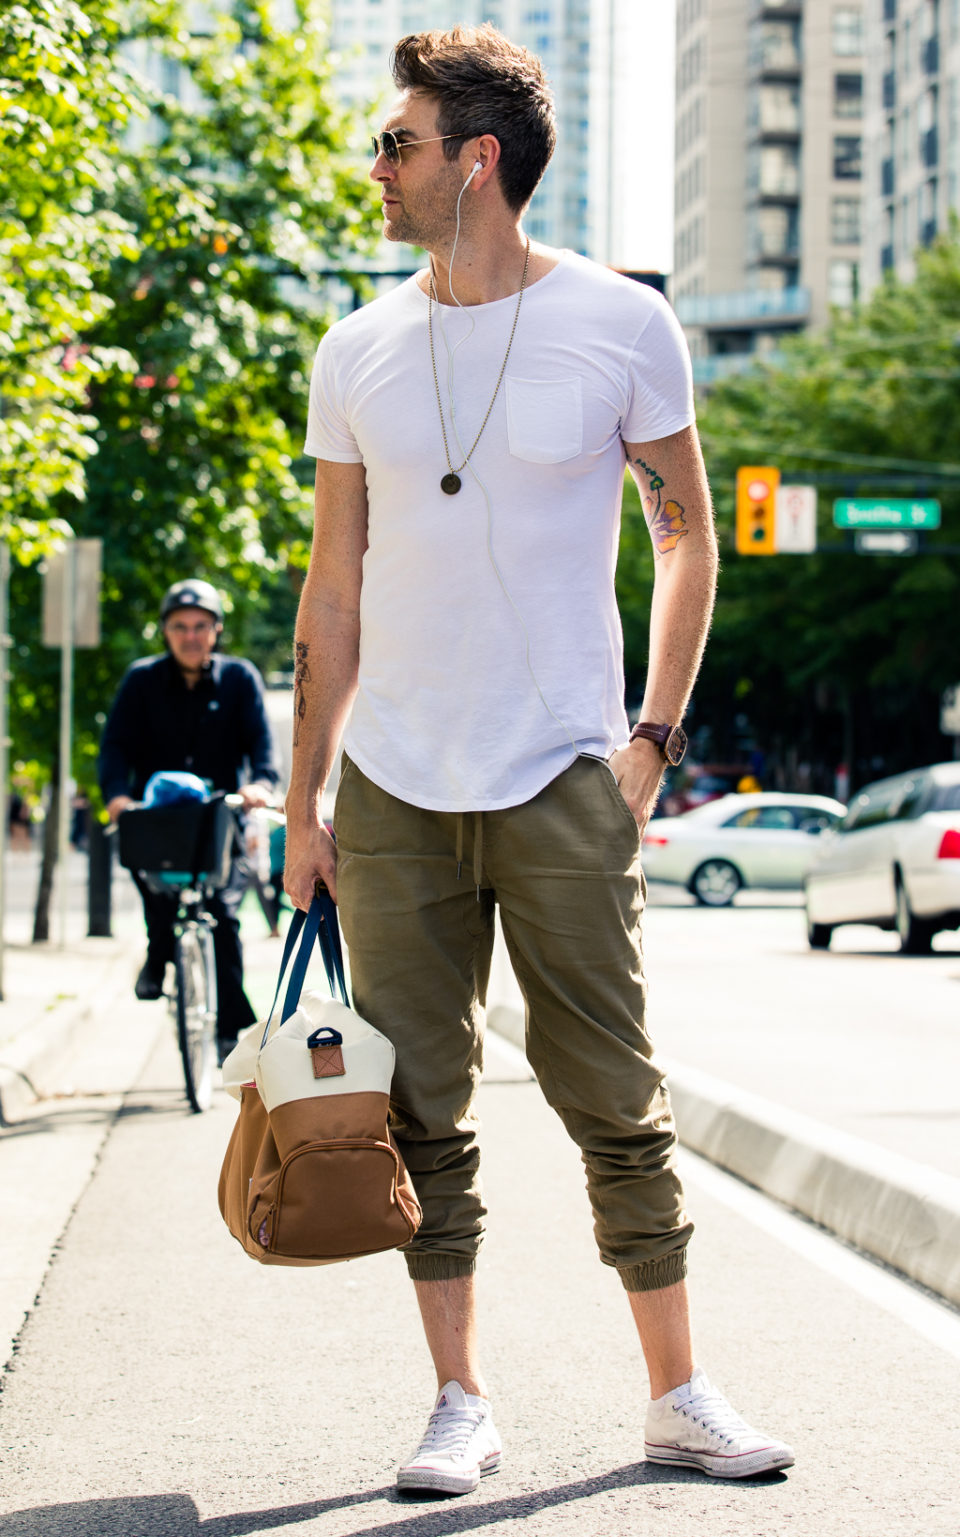 Vancouver street fashion